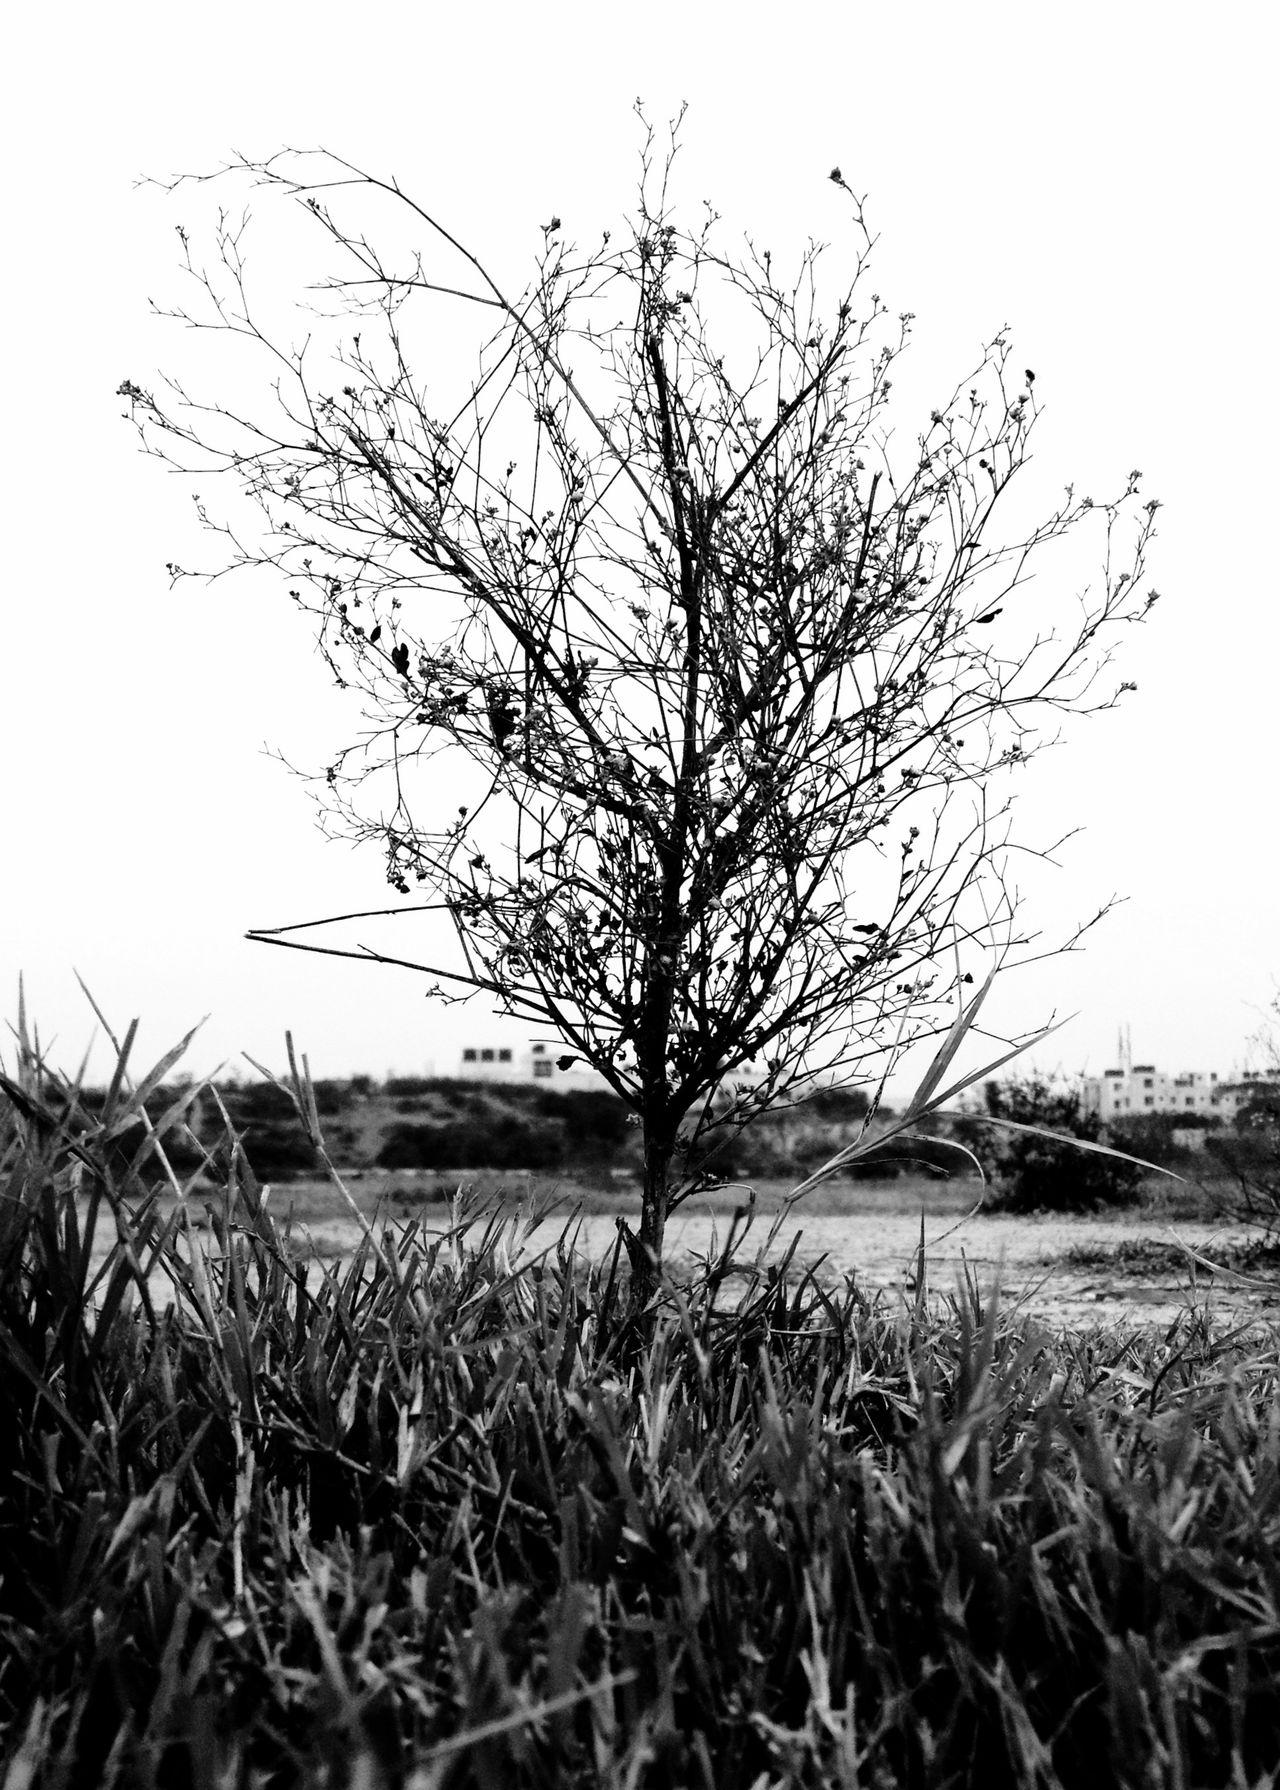 Plant Grass Blackandwhite Photography Black And White Photography Blackandwhitephotography IPhoneography Iphoneonly IPhone Iphonephotography Iphonesia IPhone Photography IPhone 4S IPhone4s Mobilephotography Mobile Photography Mobilephoto Bangalore India